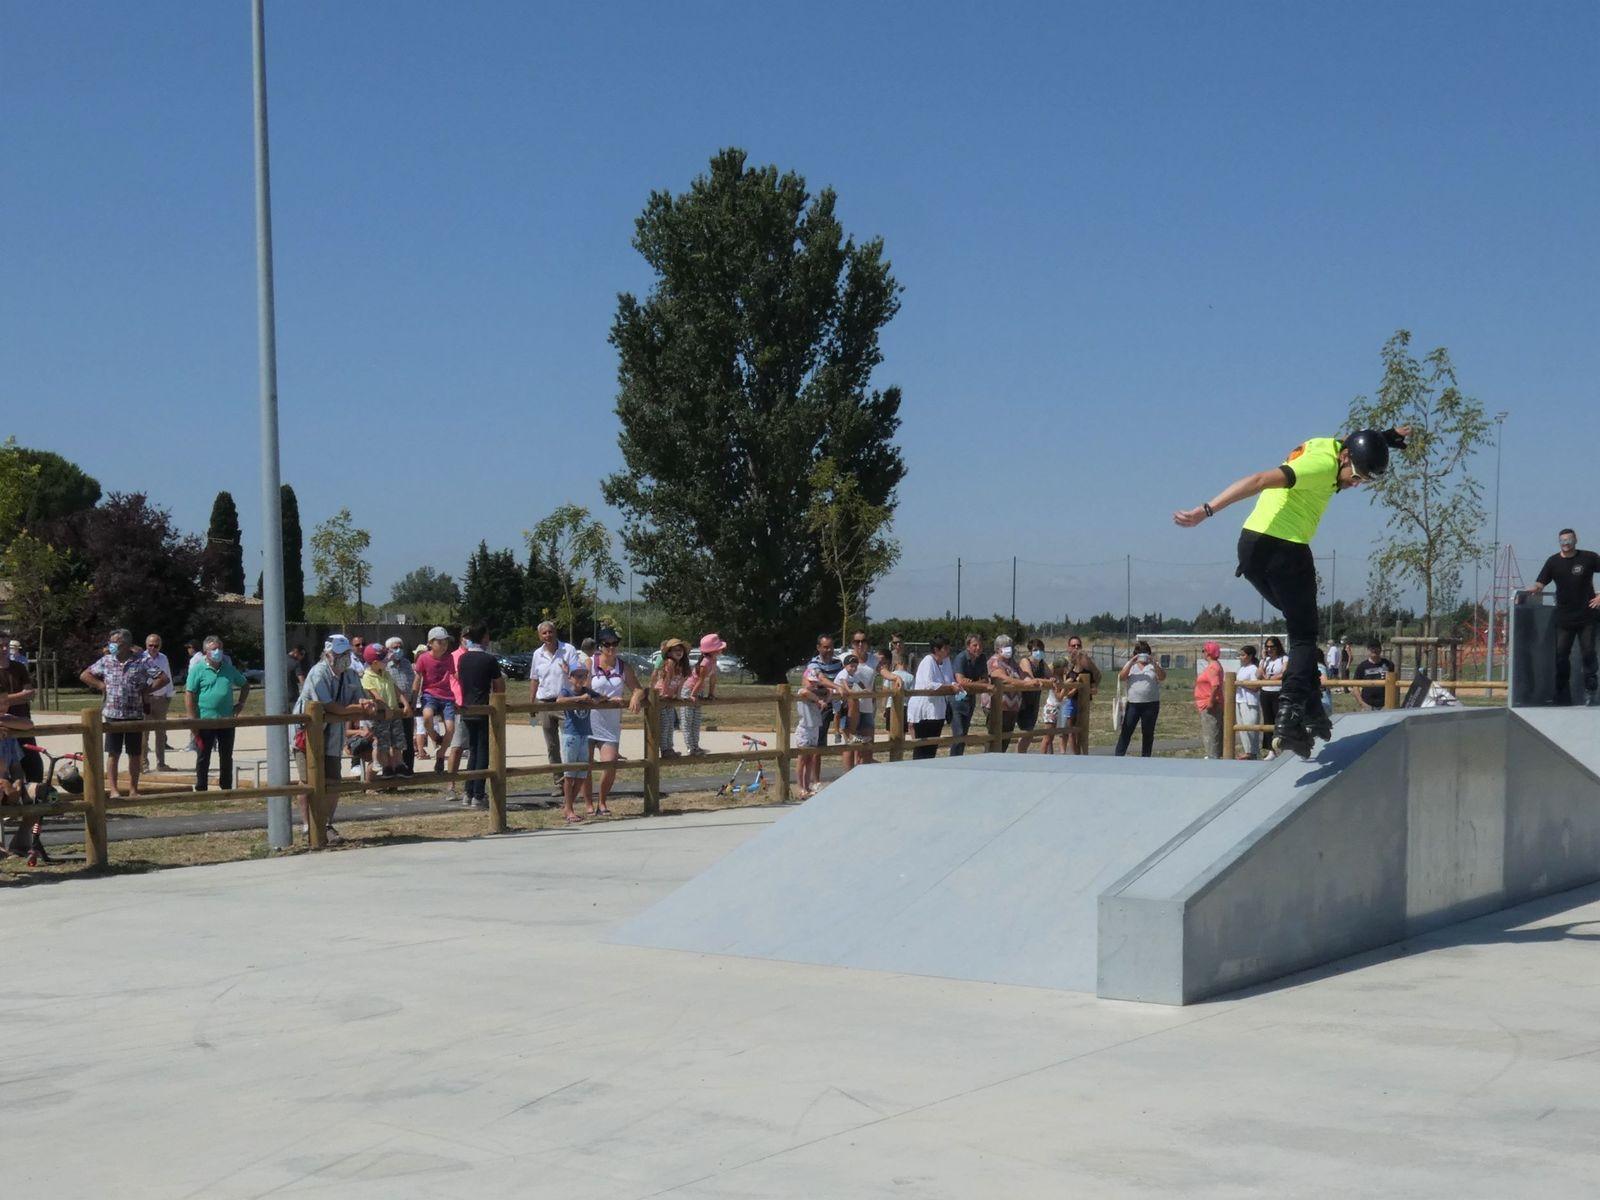 Roller Lib, skate Park, Ledge, fun Box, roller, free style, lanceur, Nîmes, Gard